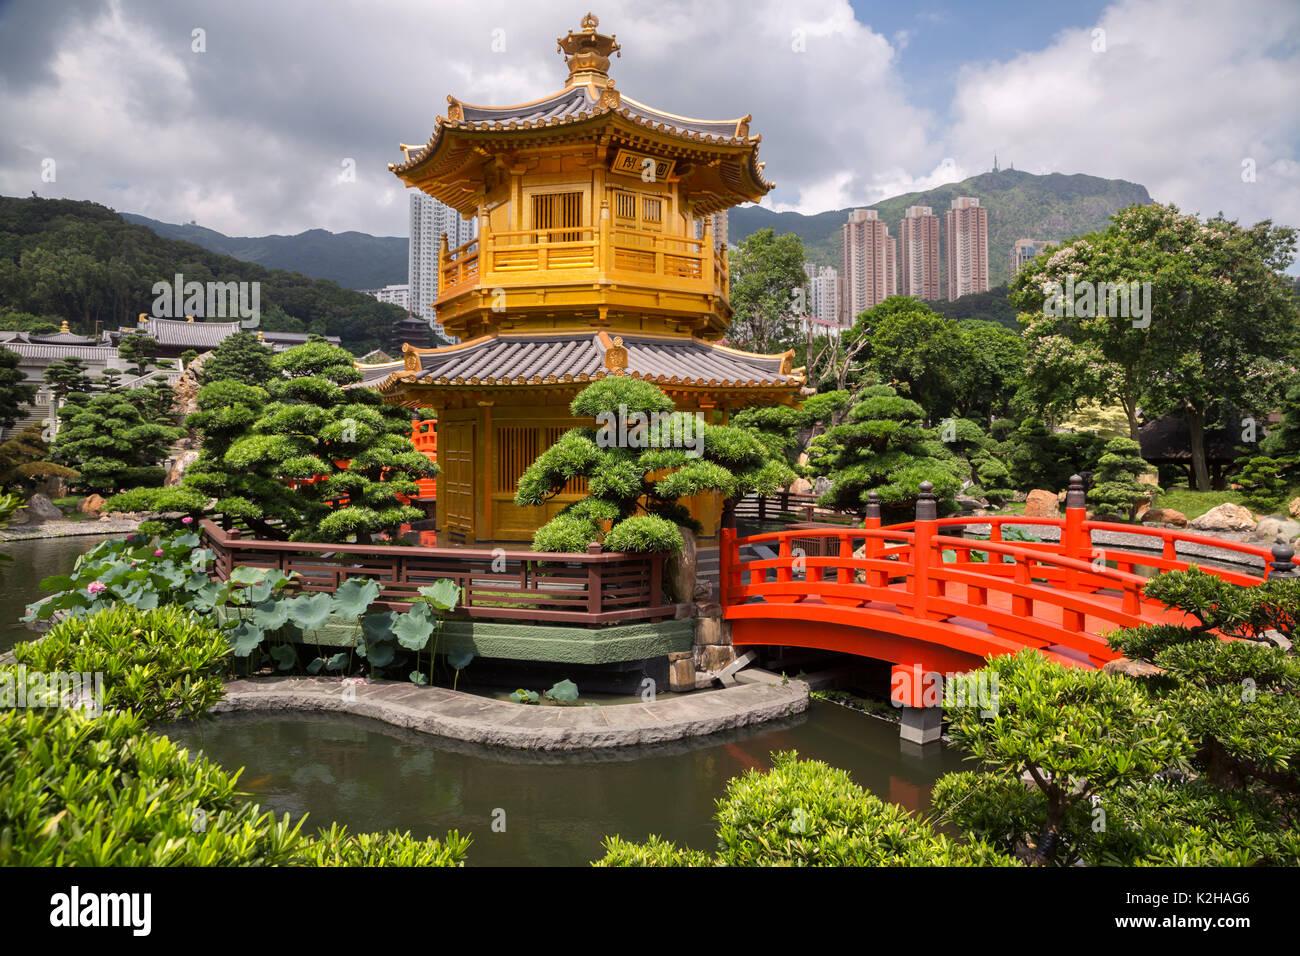 Tempel der Absolute Perfektion in Hongkong Stockbild